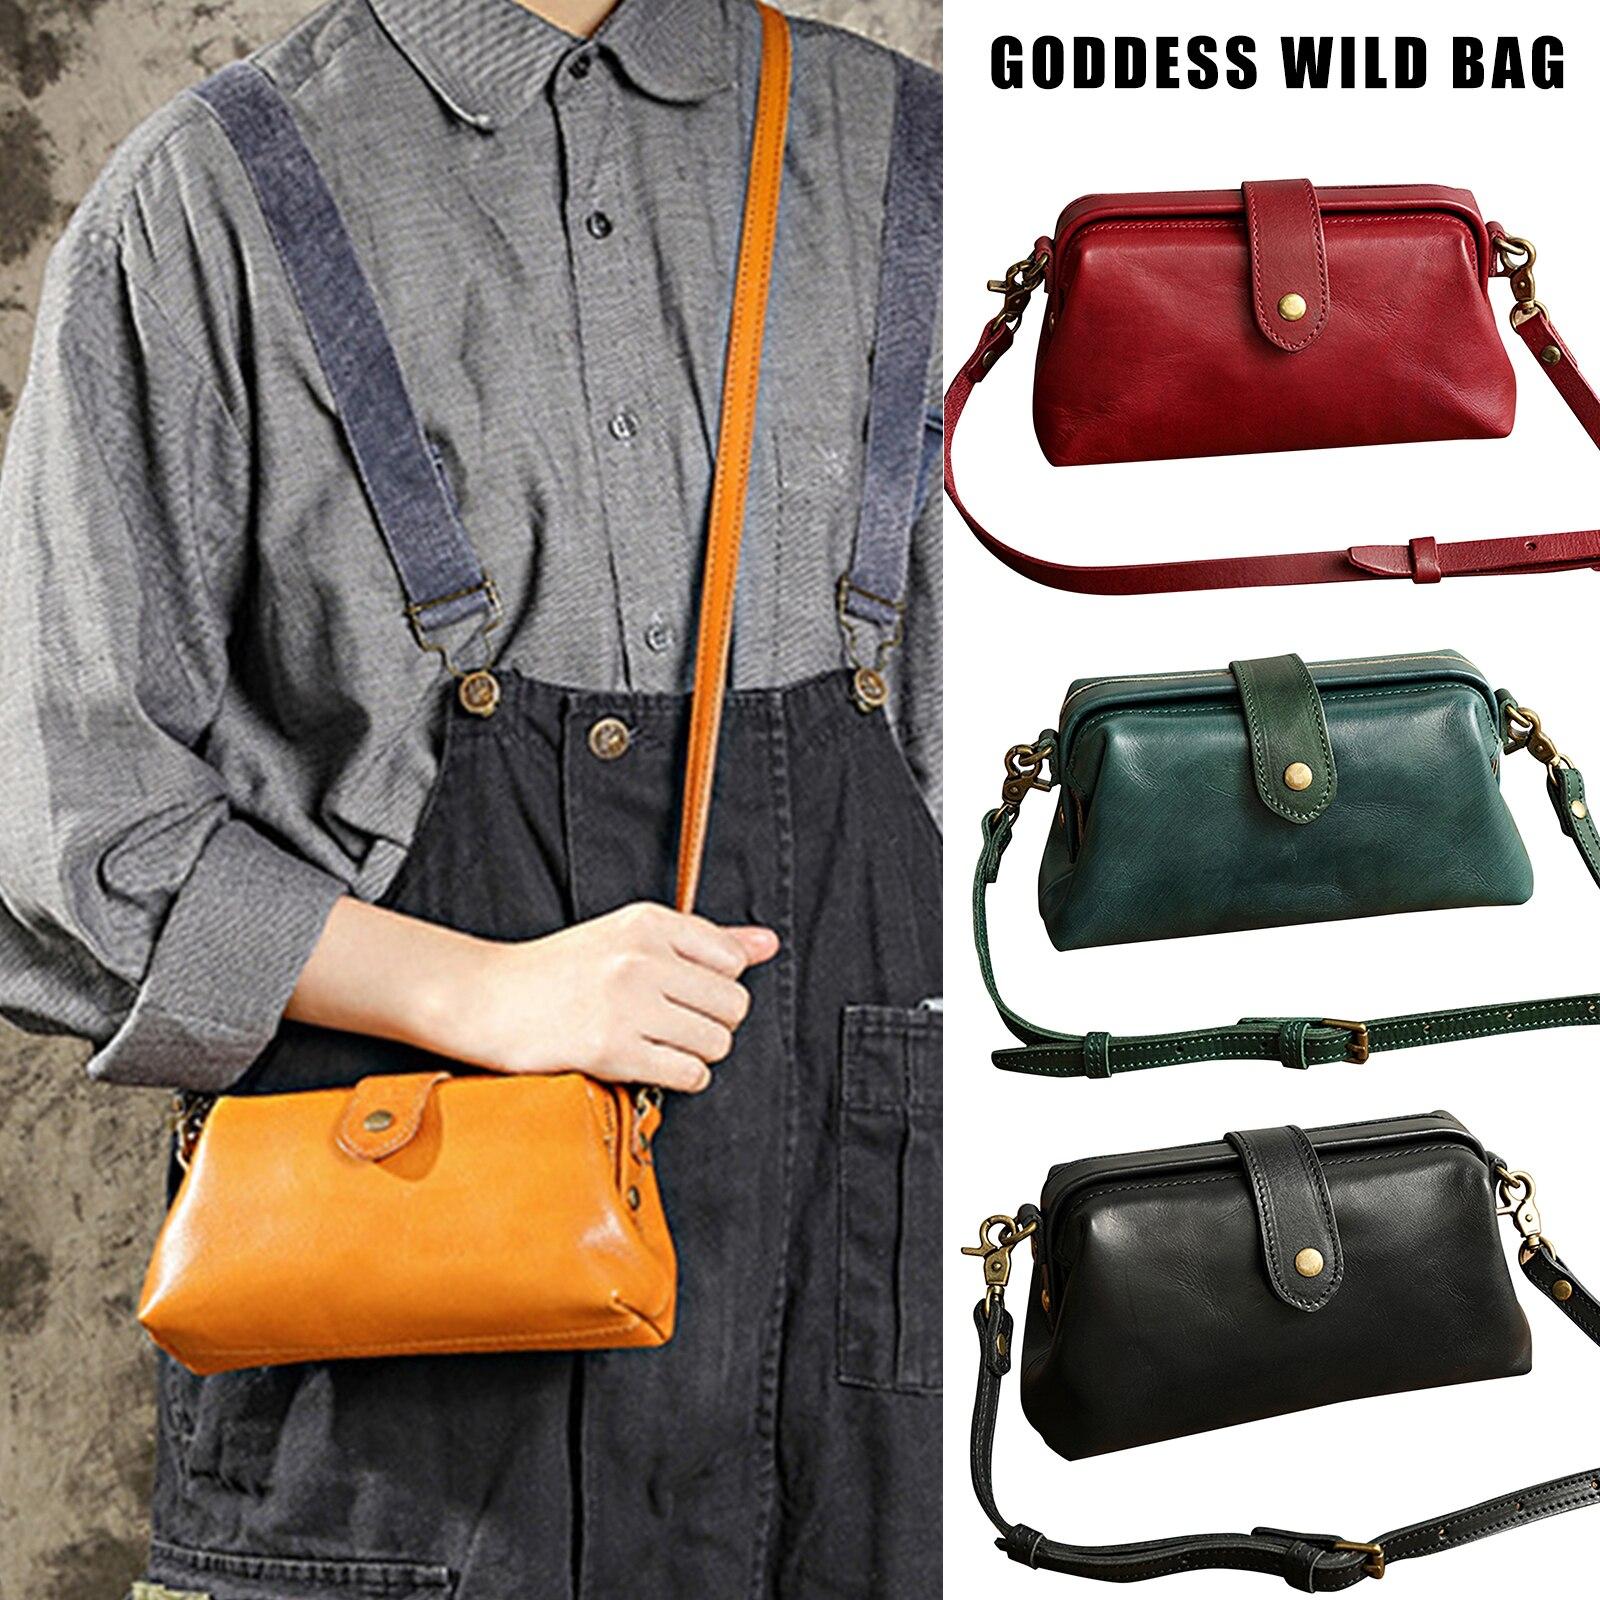 Premium Leather Retro Handmade Bag Unique Opening Small Women Crossboy Bag FS99